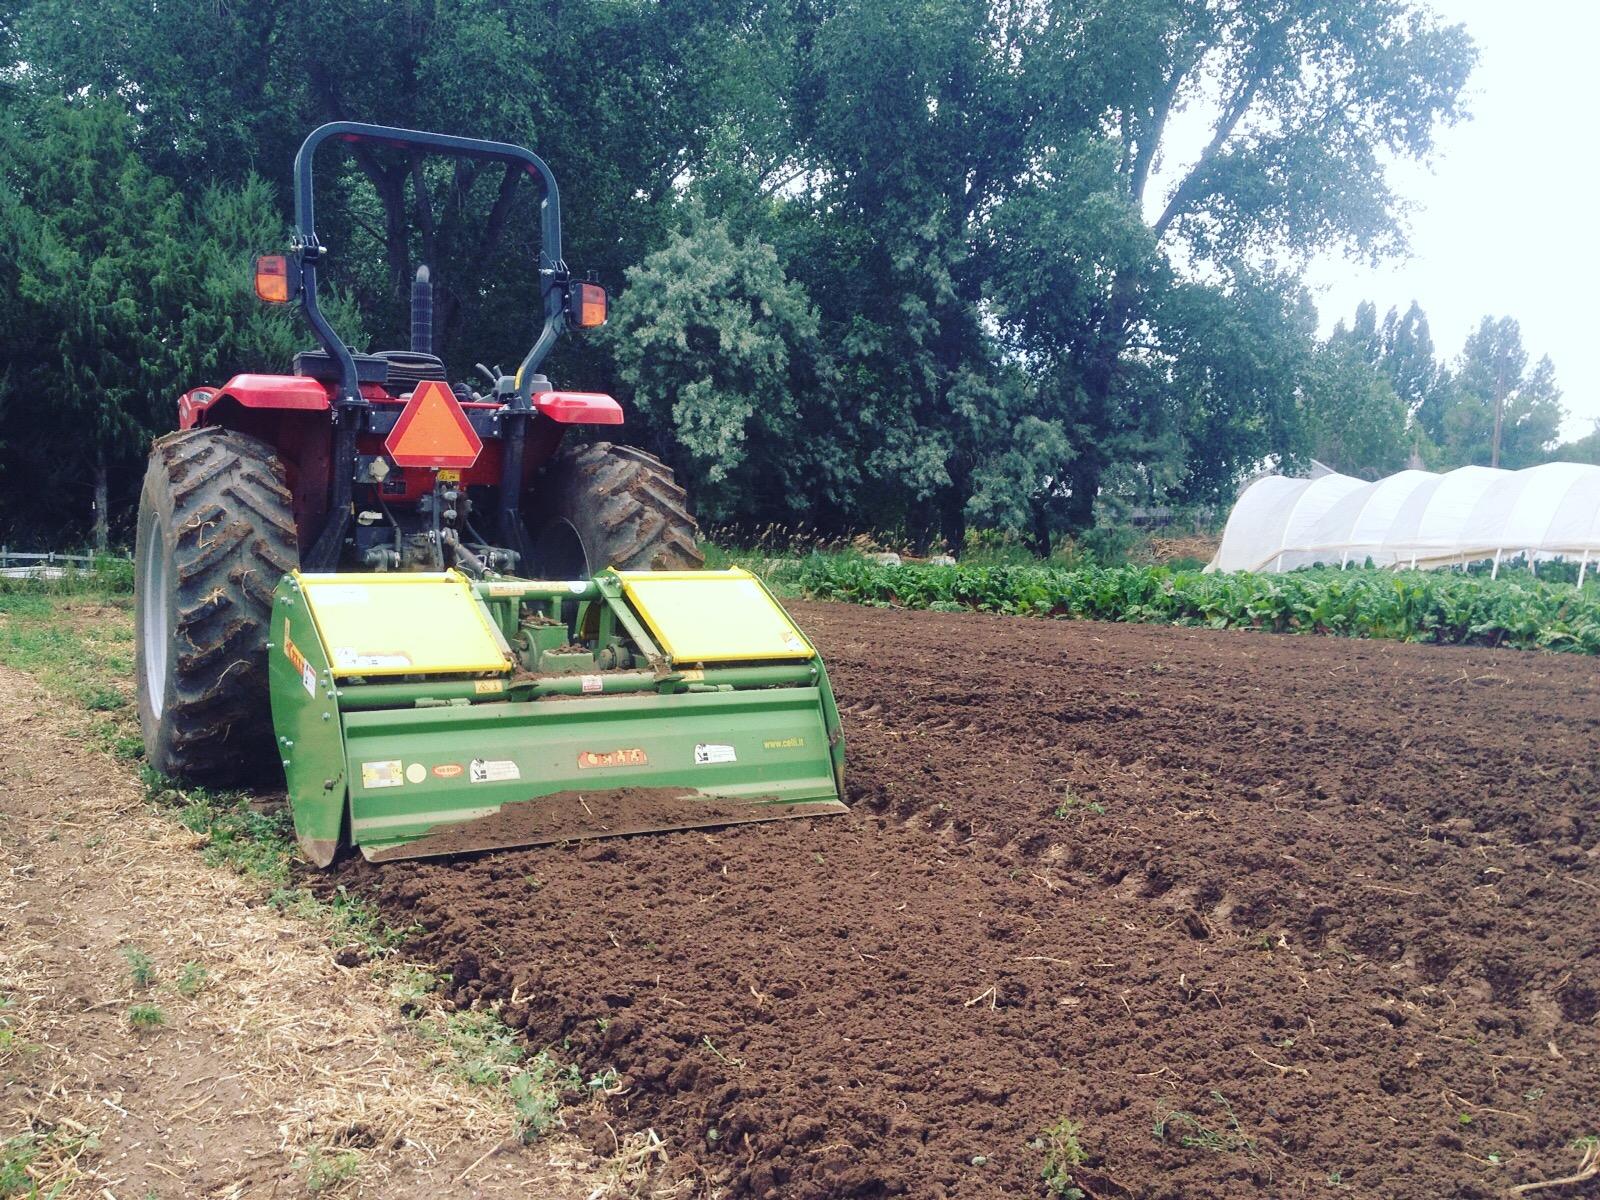 And...a new Celli spader! Viva Italia! (Photo by Farmer Nic)